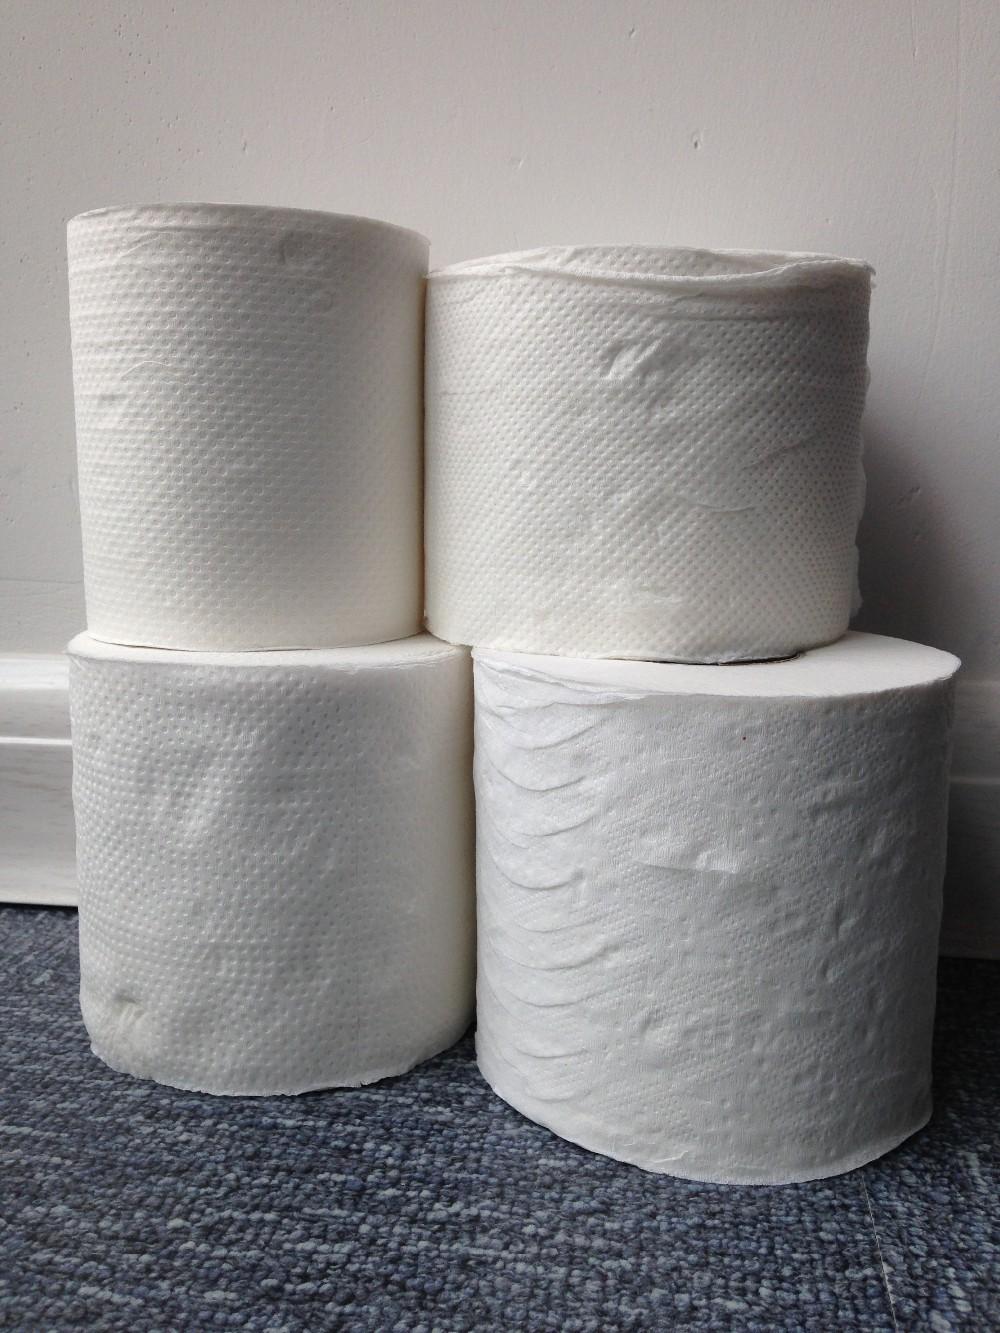 Toilet Paper Rolls Printed Paper Joke Toilet Paper, Toilet Paper ...